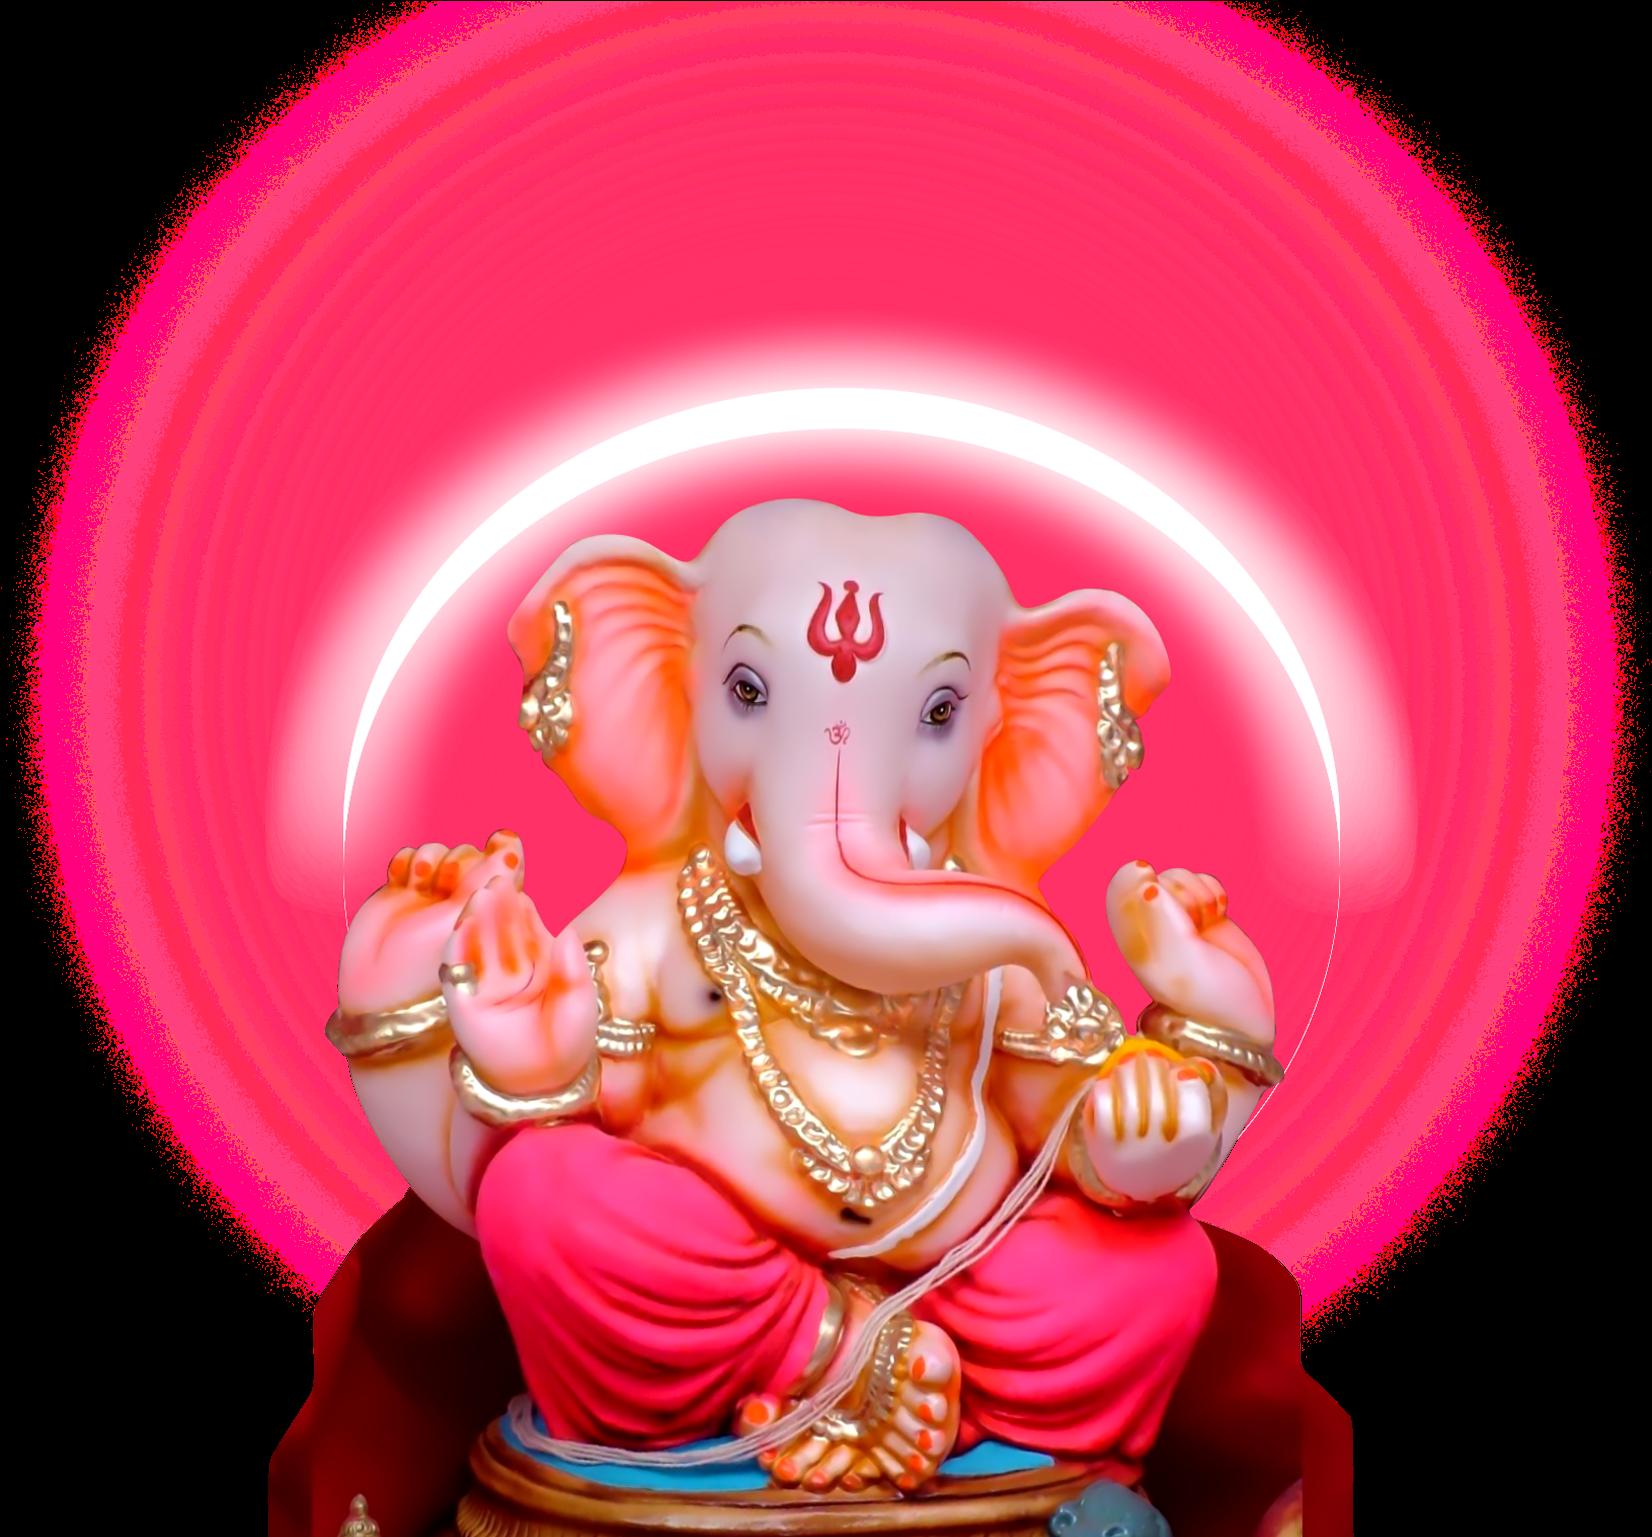 HD Lord Ganesha Png Images Enam Wallpaper.